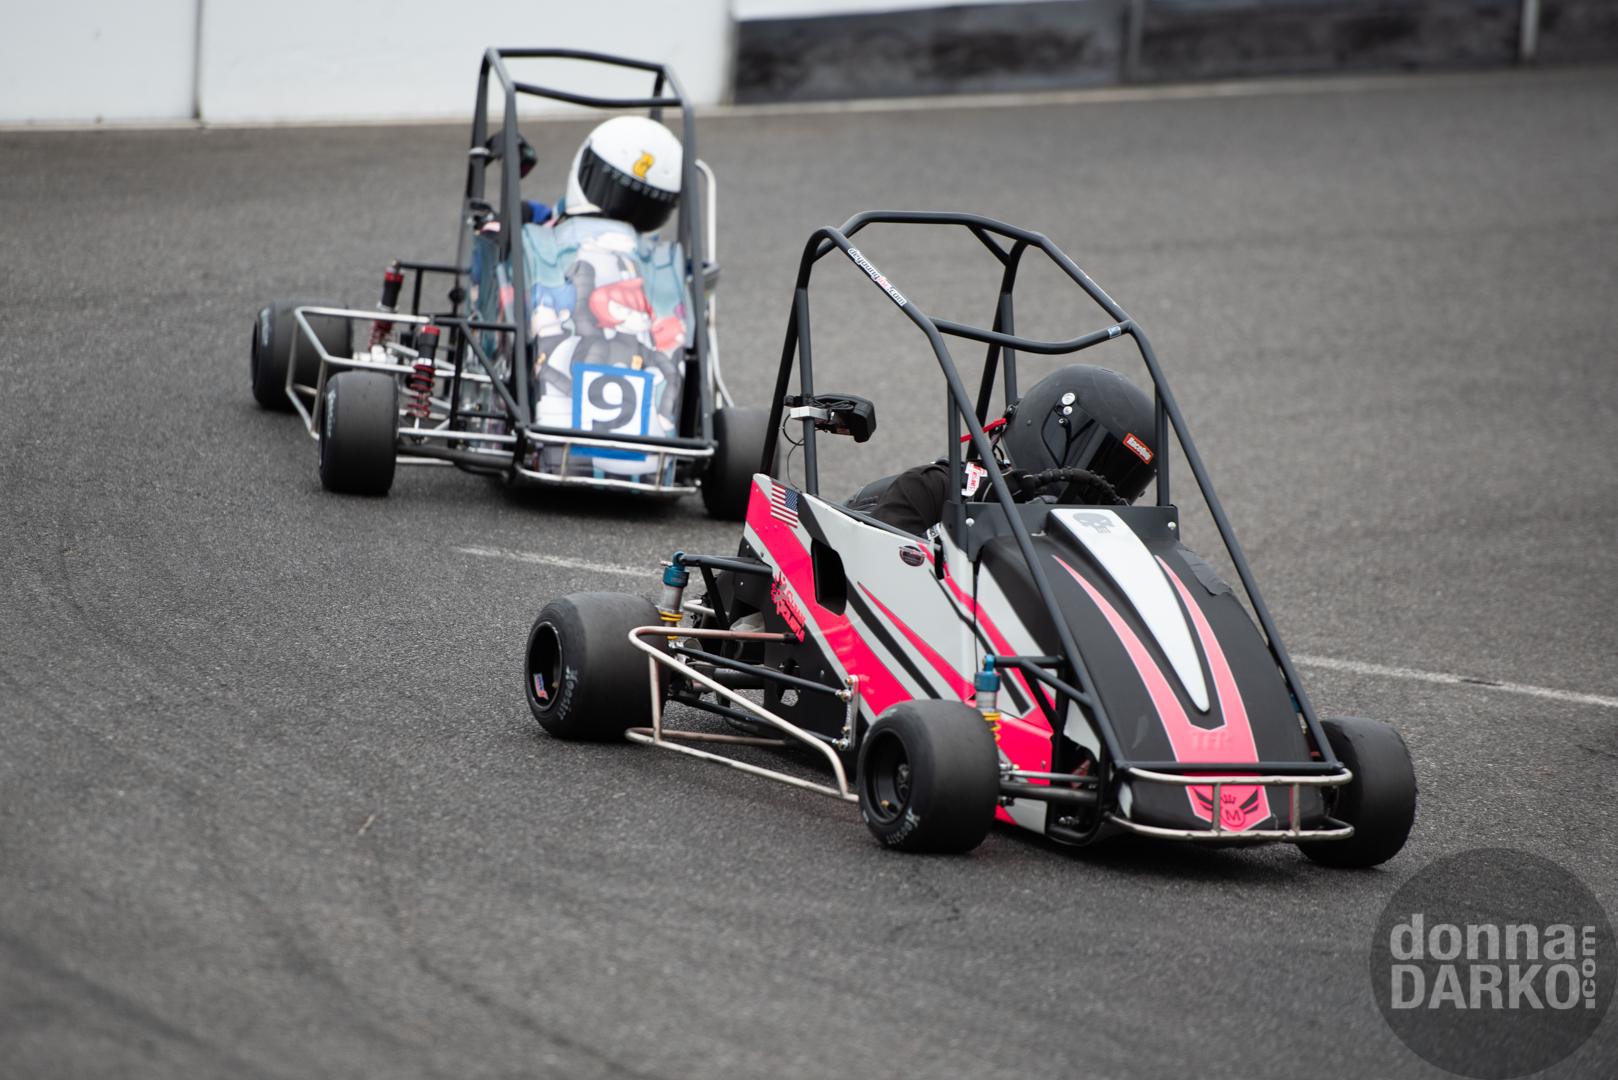 QWMA (Racing) 8-11-2019 DSC_6424.jpg